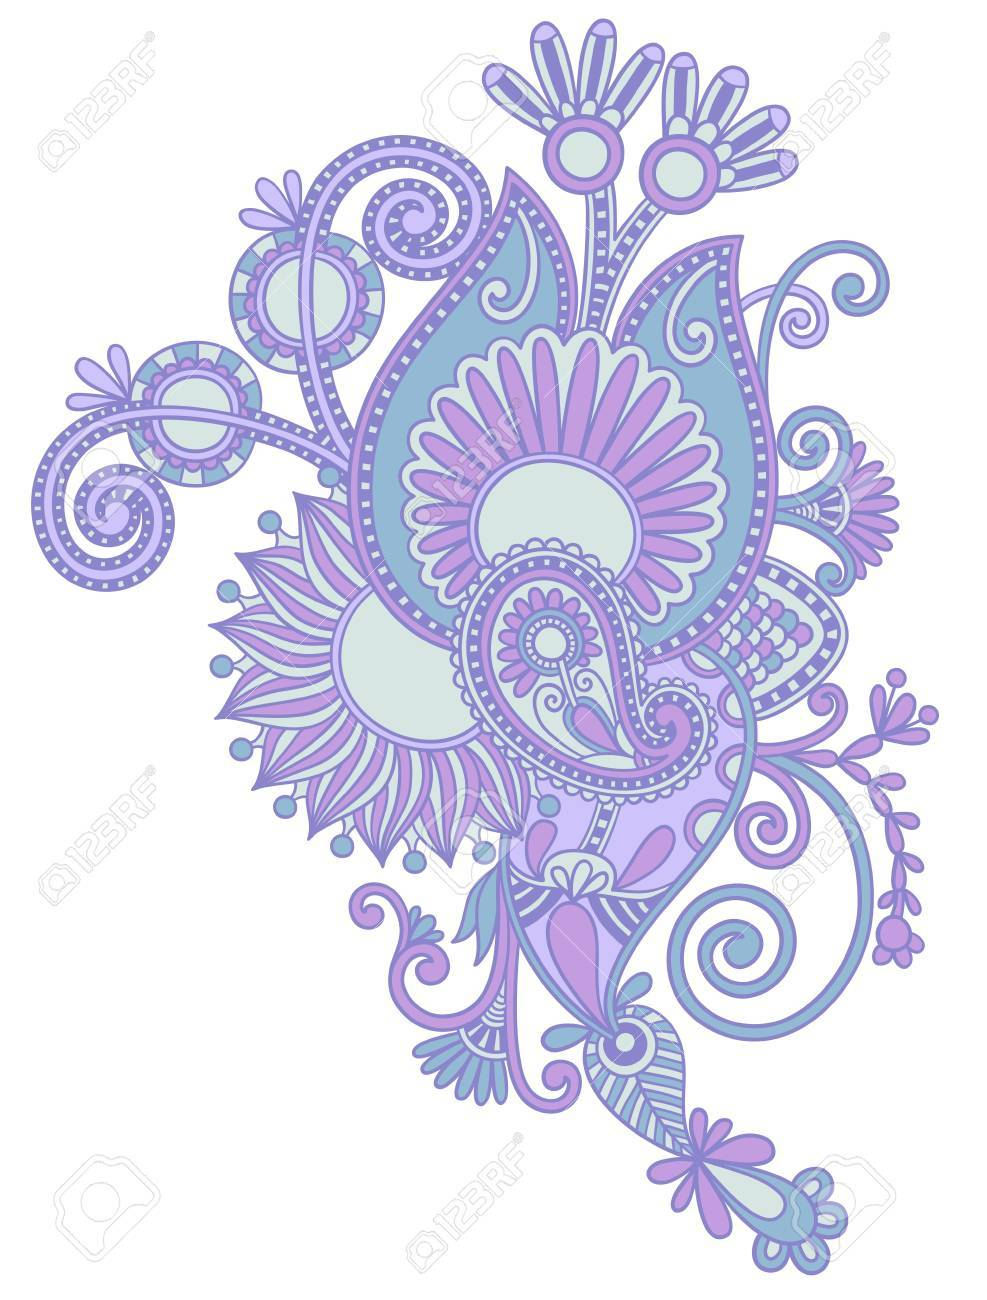 original hand draw line art ornate flower design. Ukrainian traditional style Stock Vector - 15110459